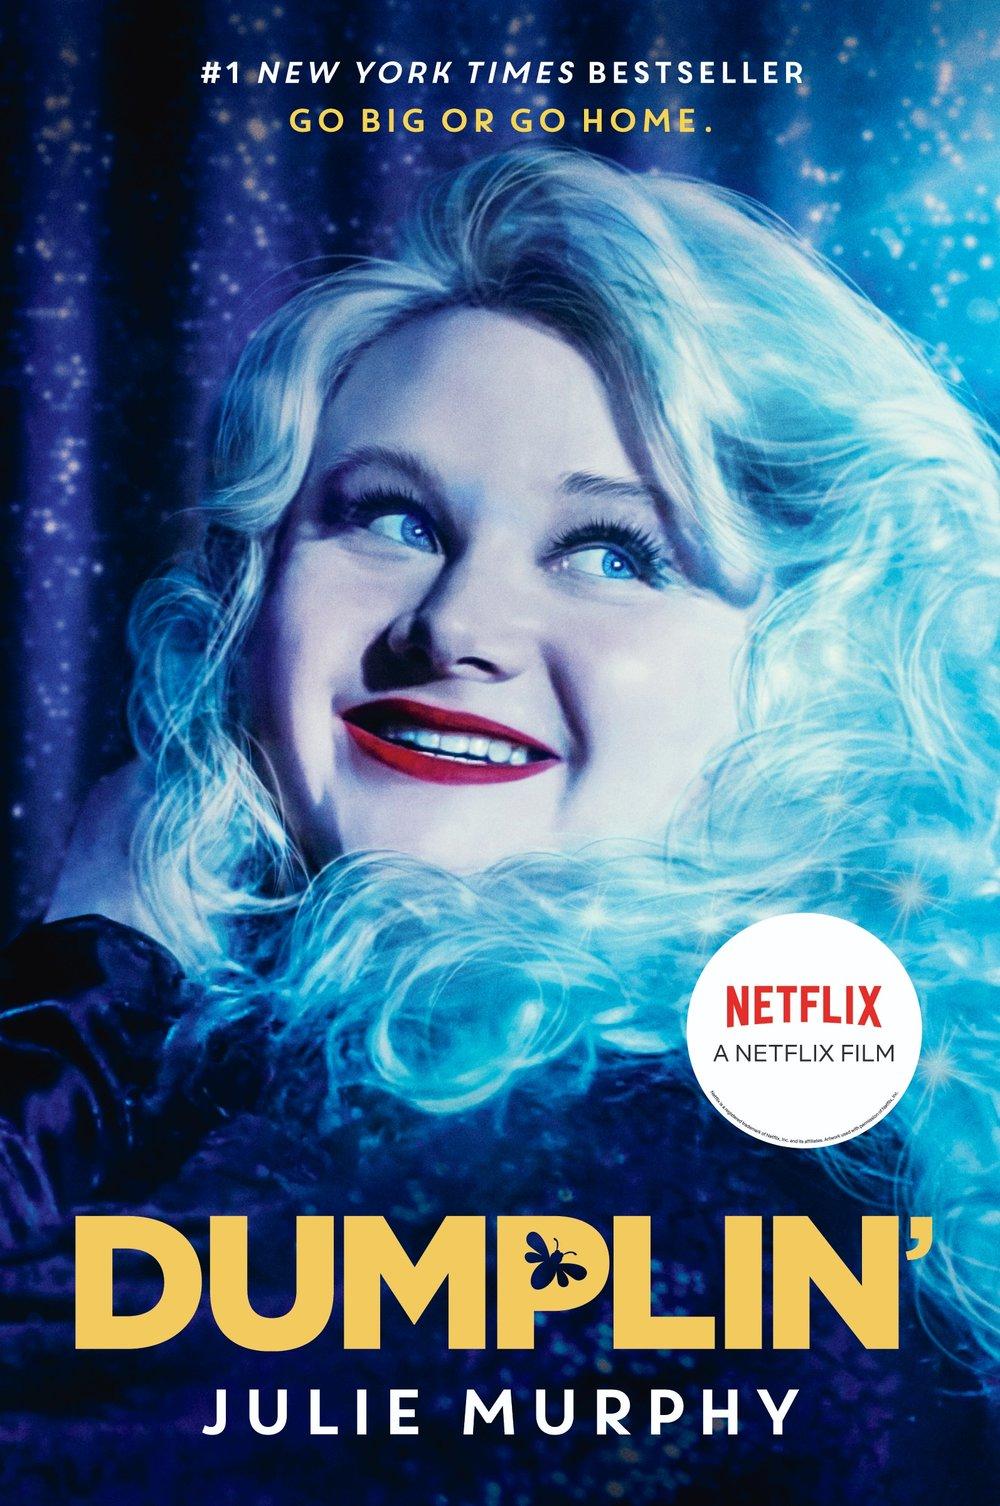 murphy-dumplin-movie-tiein.jpg